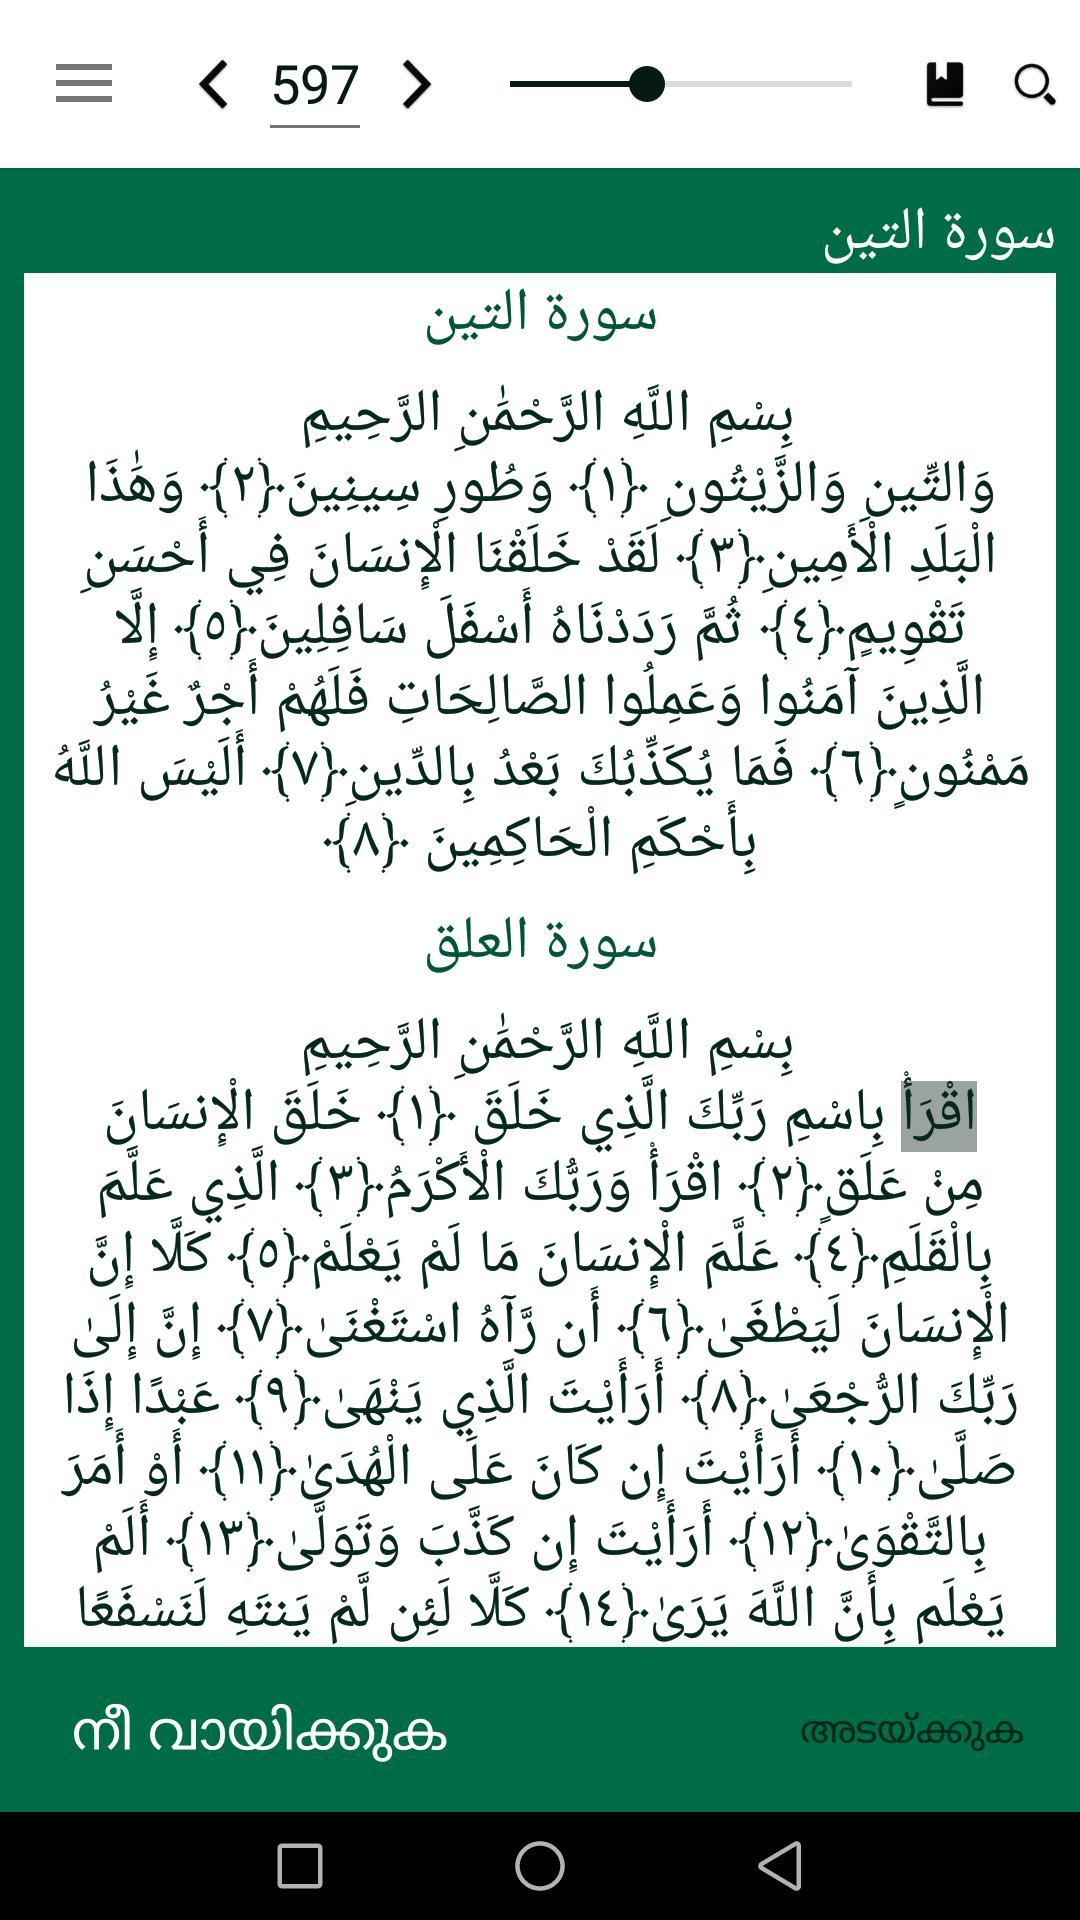 Kalaam Allah - Quran Malayalam (Thafheem-ul-quran) for